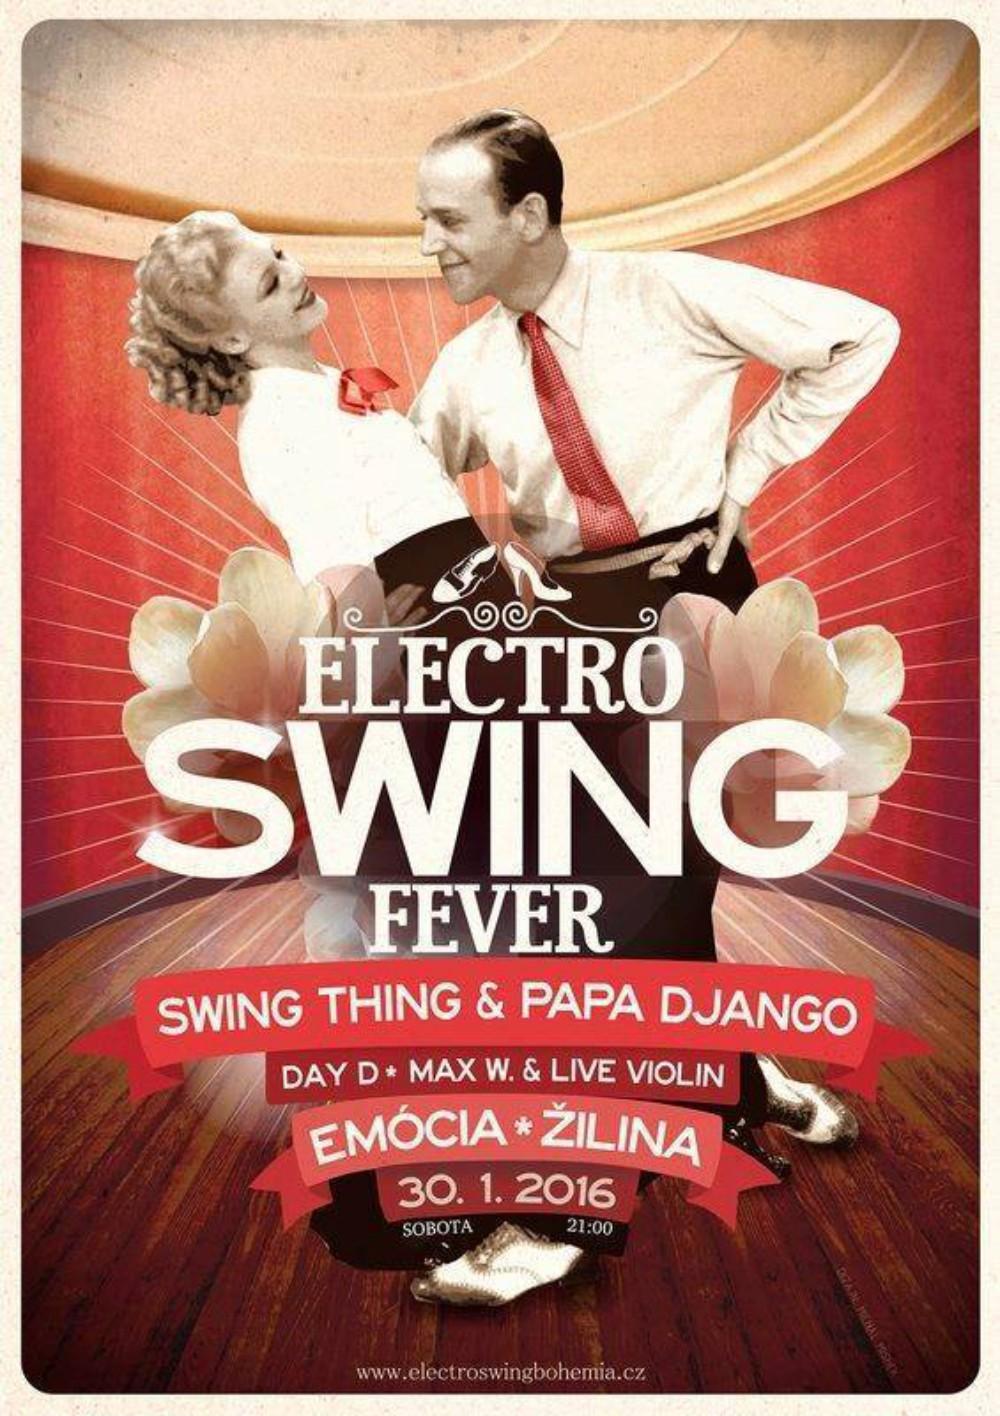 eveontova-agentura-Electro-Swing-Fever-emocia-zilina